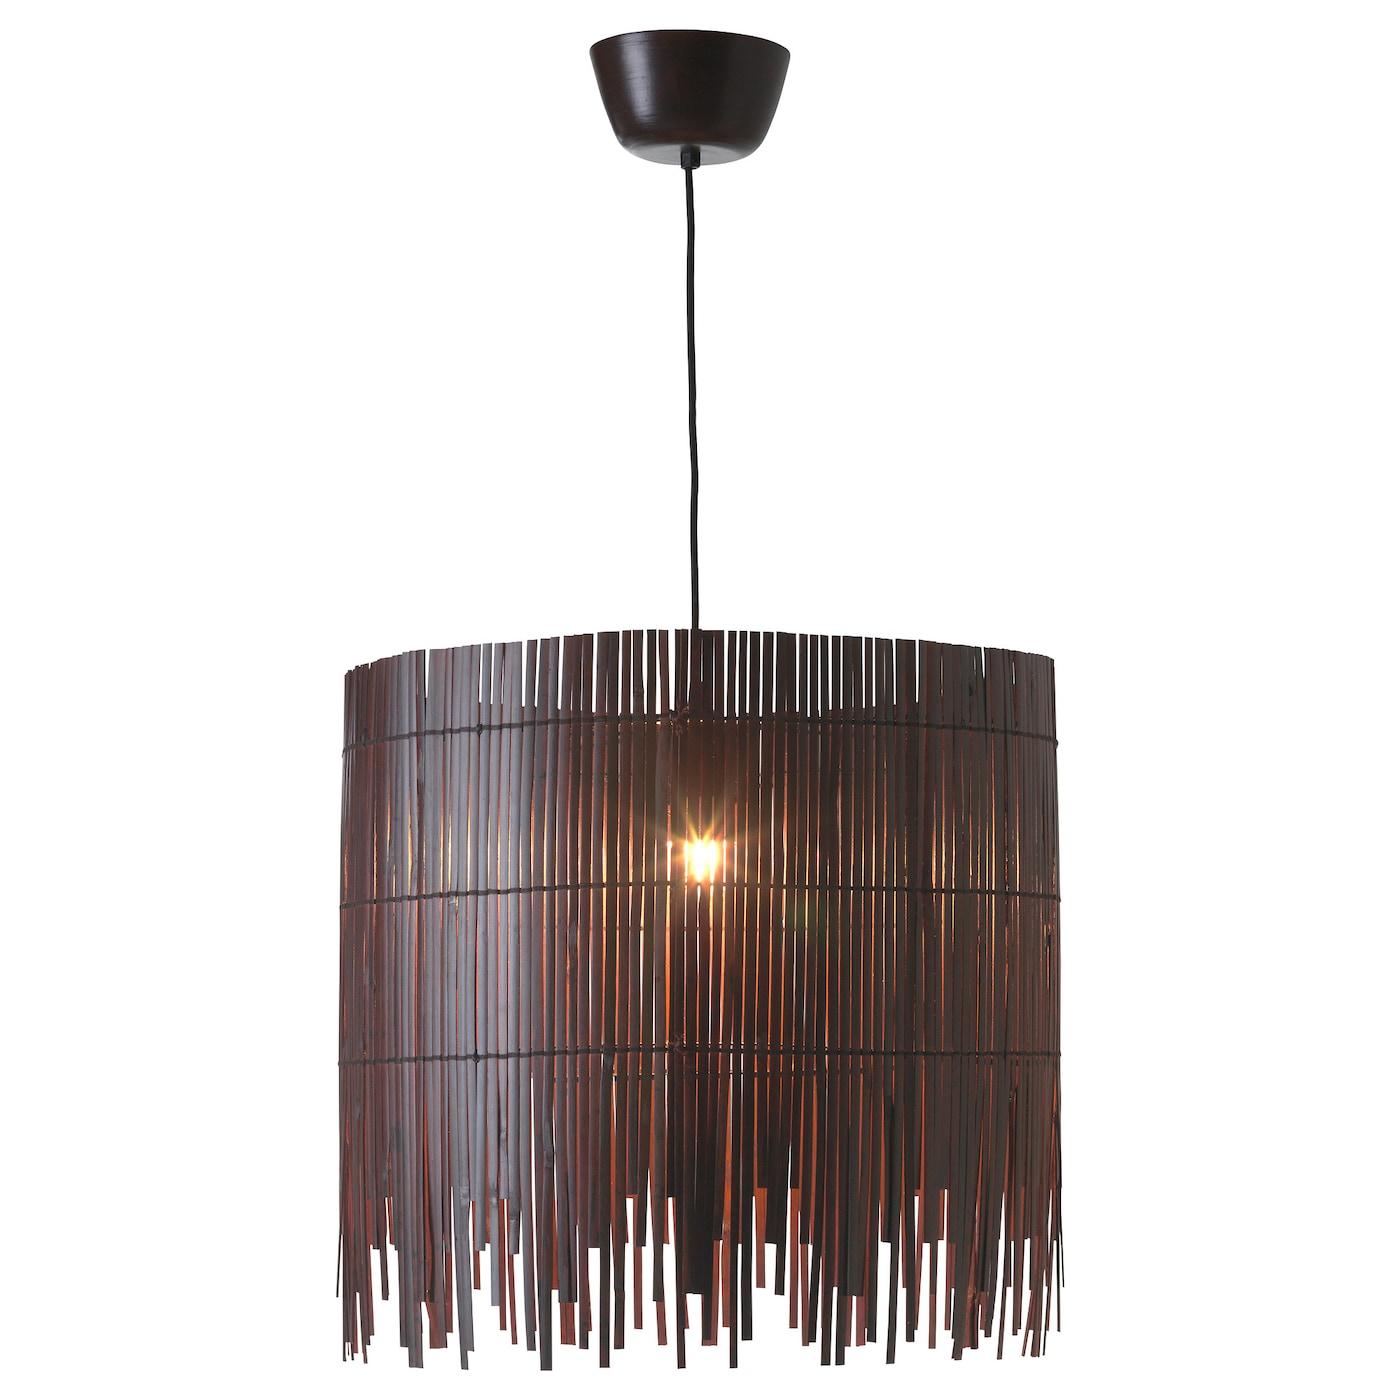 Genoeg ROTVIK Hanglamp Bamboe/bruin - IKEA @KX66